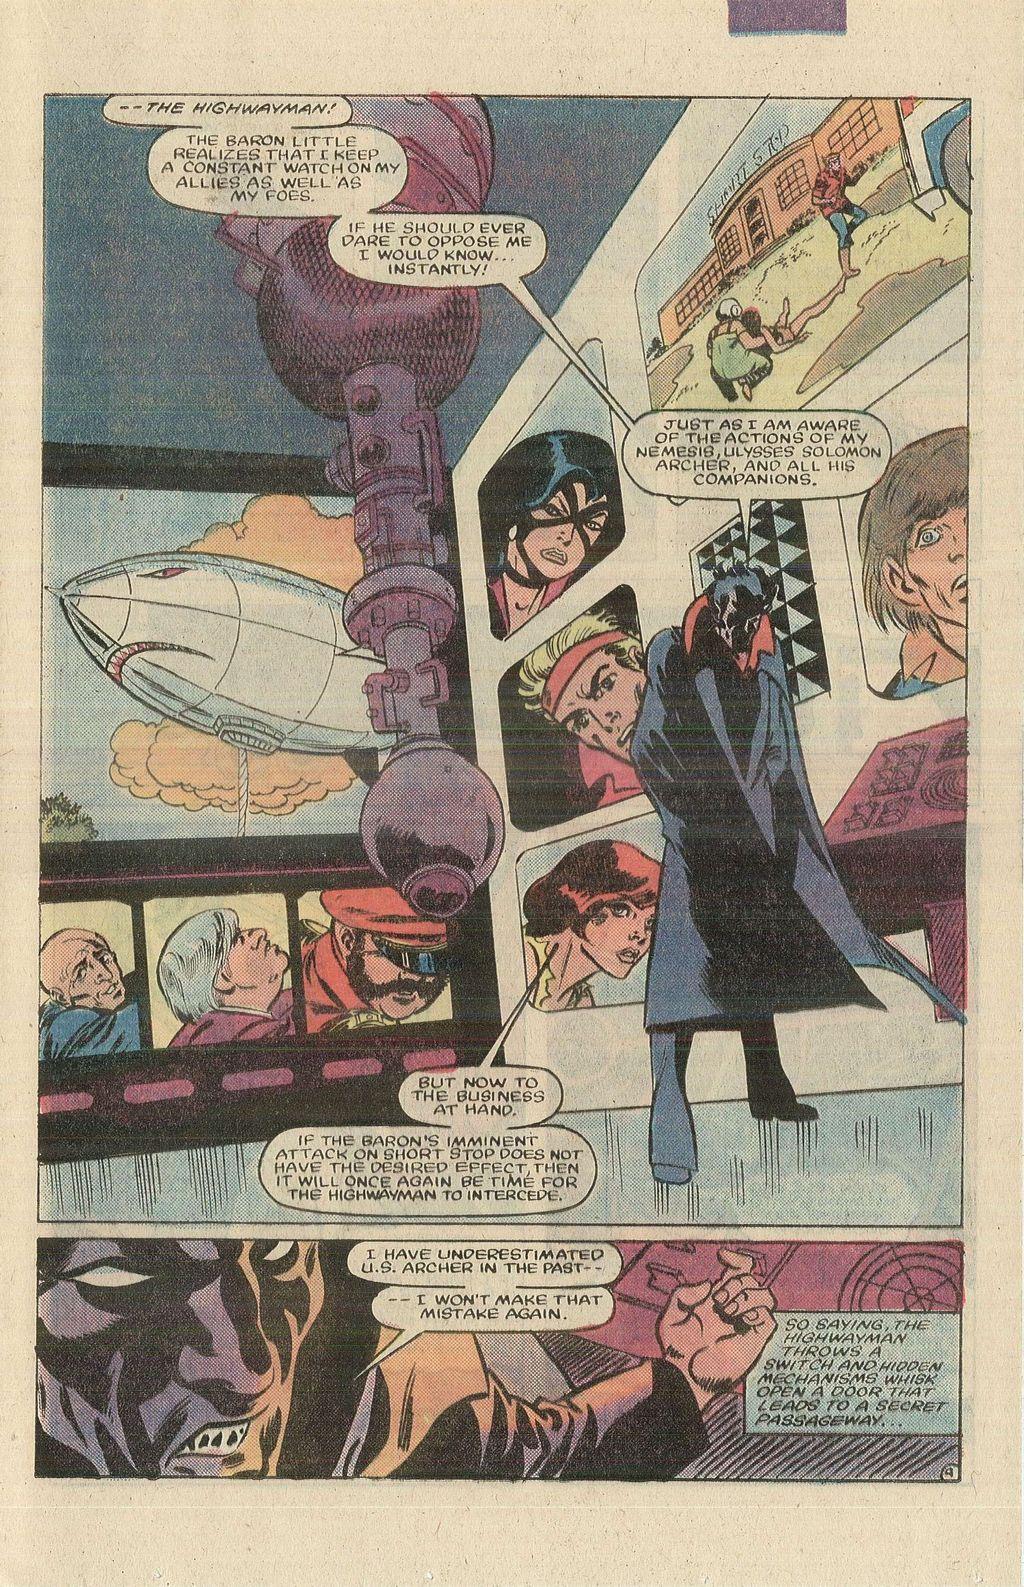 Read online U.S. 1 comic -  Issue #9 - 13